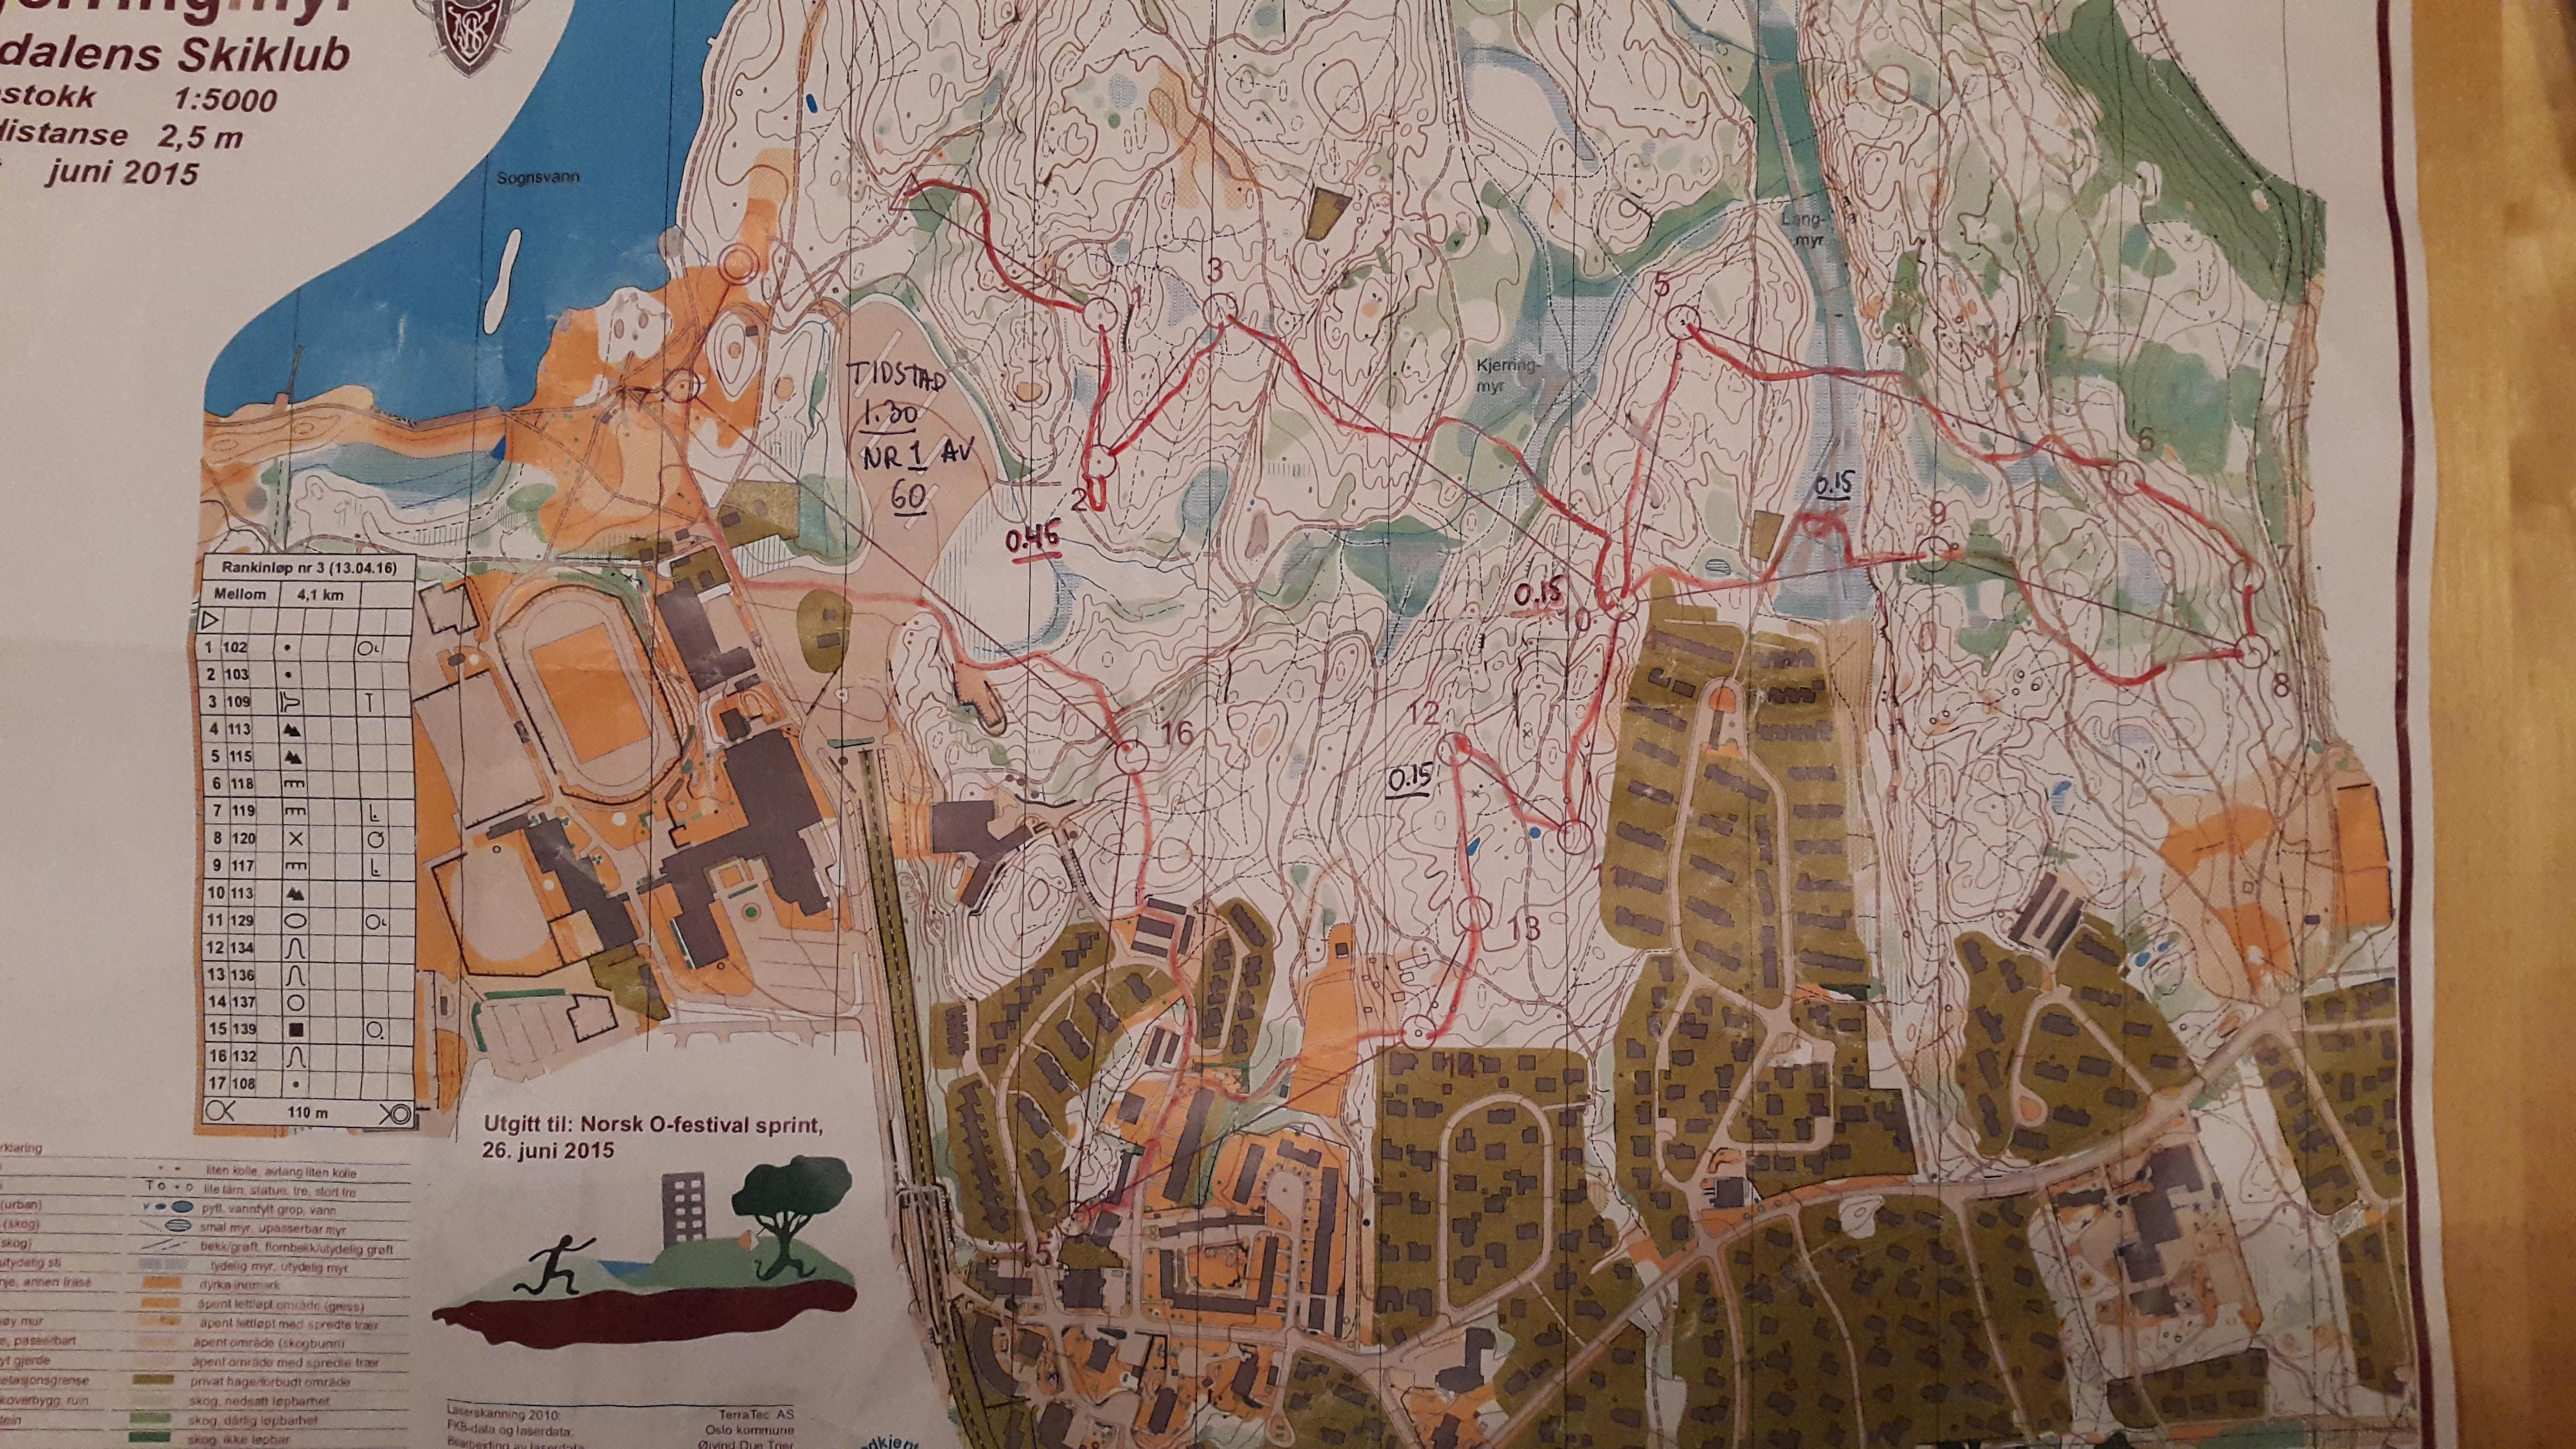 Geoform 3, Rankingløp Mellomløypa (4,1 km) (13.04.2016)